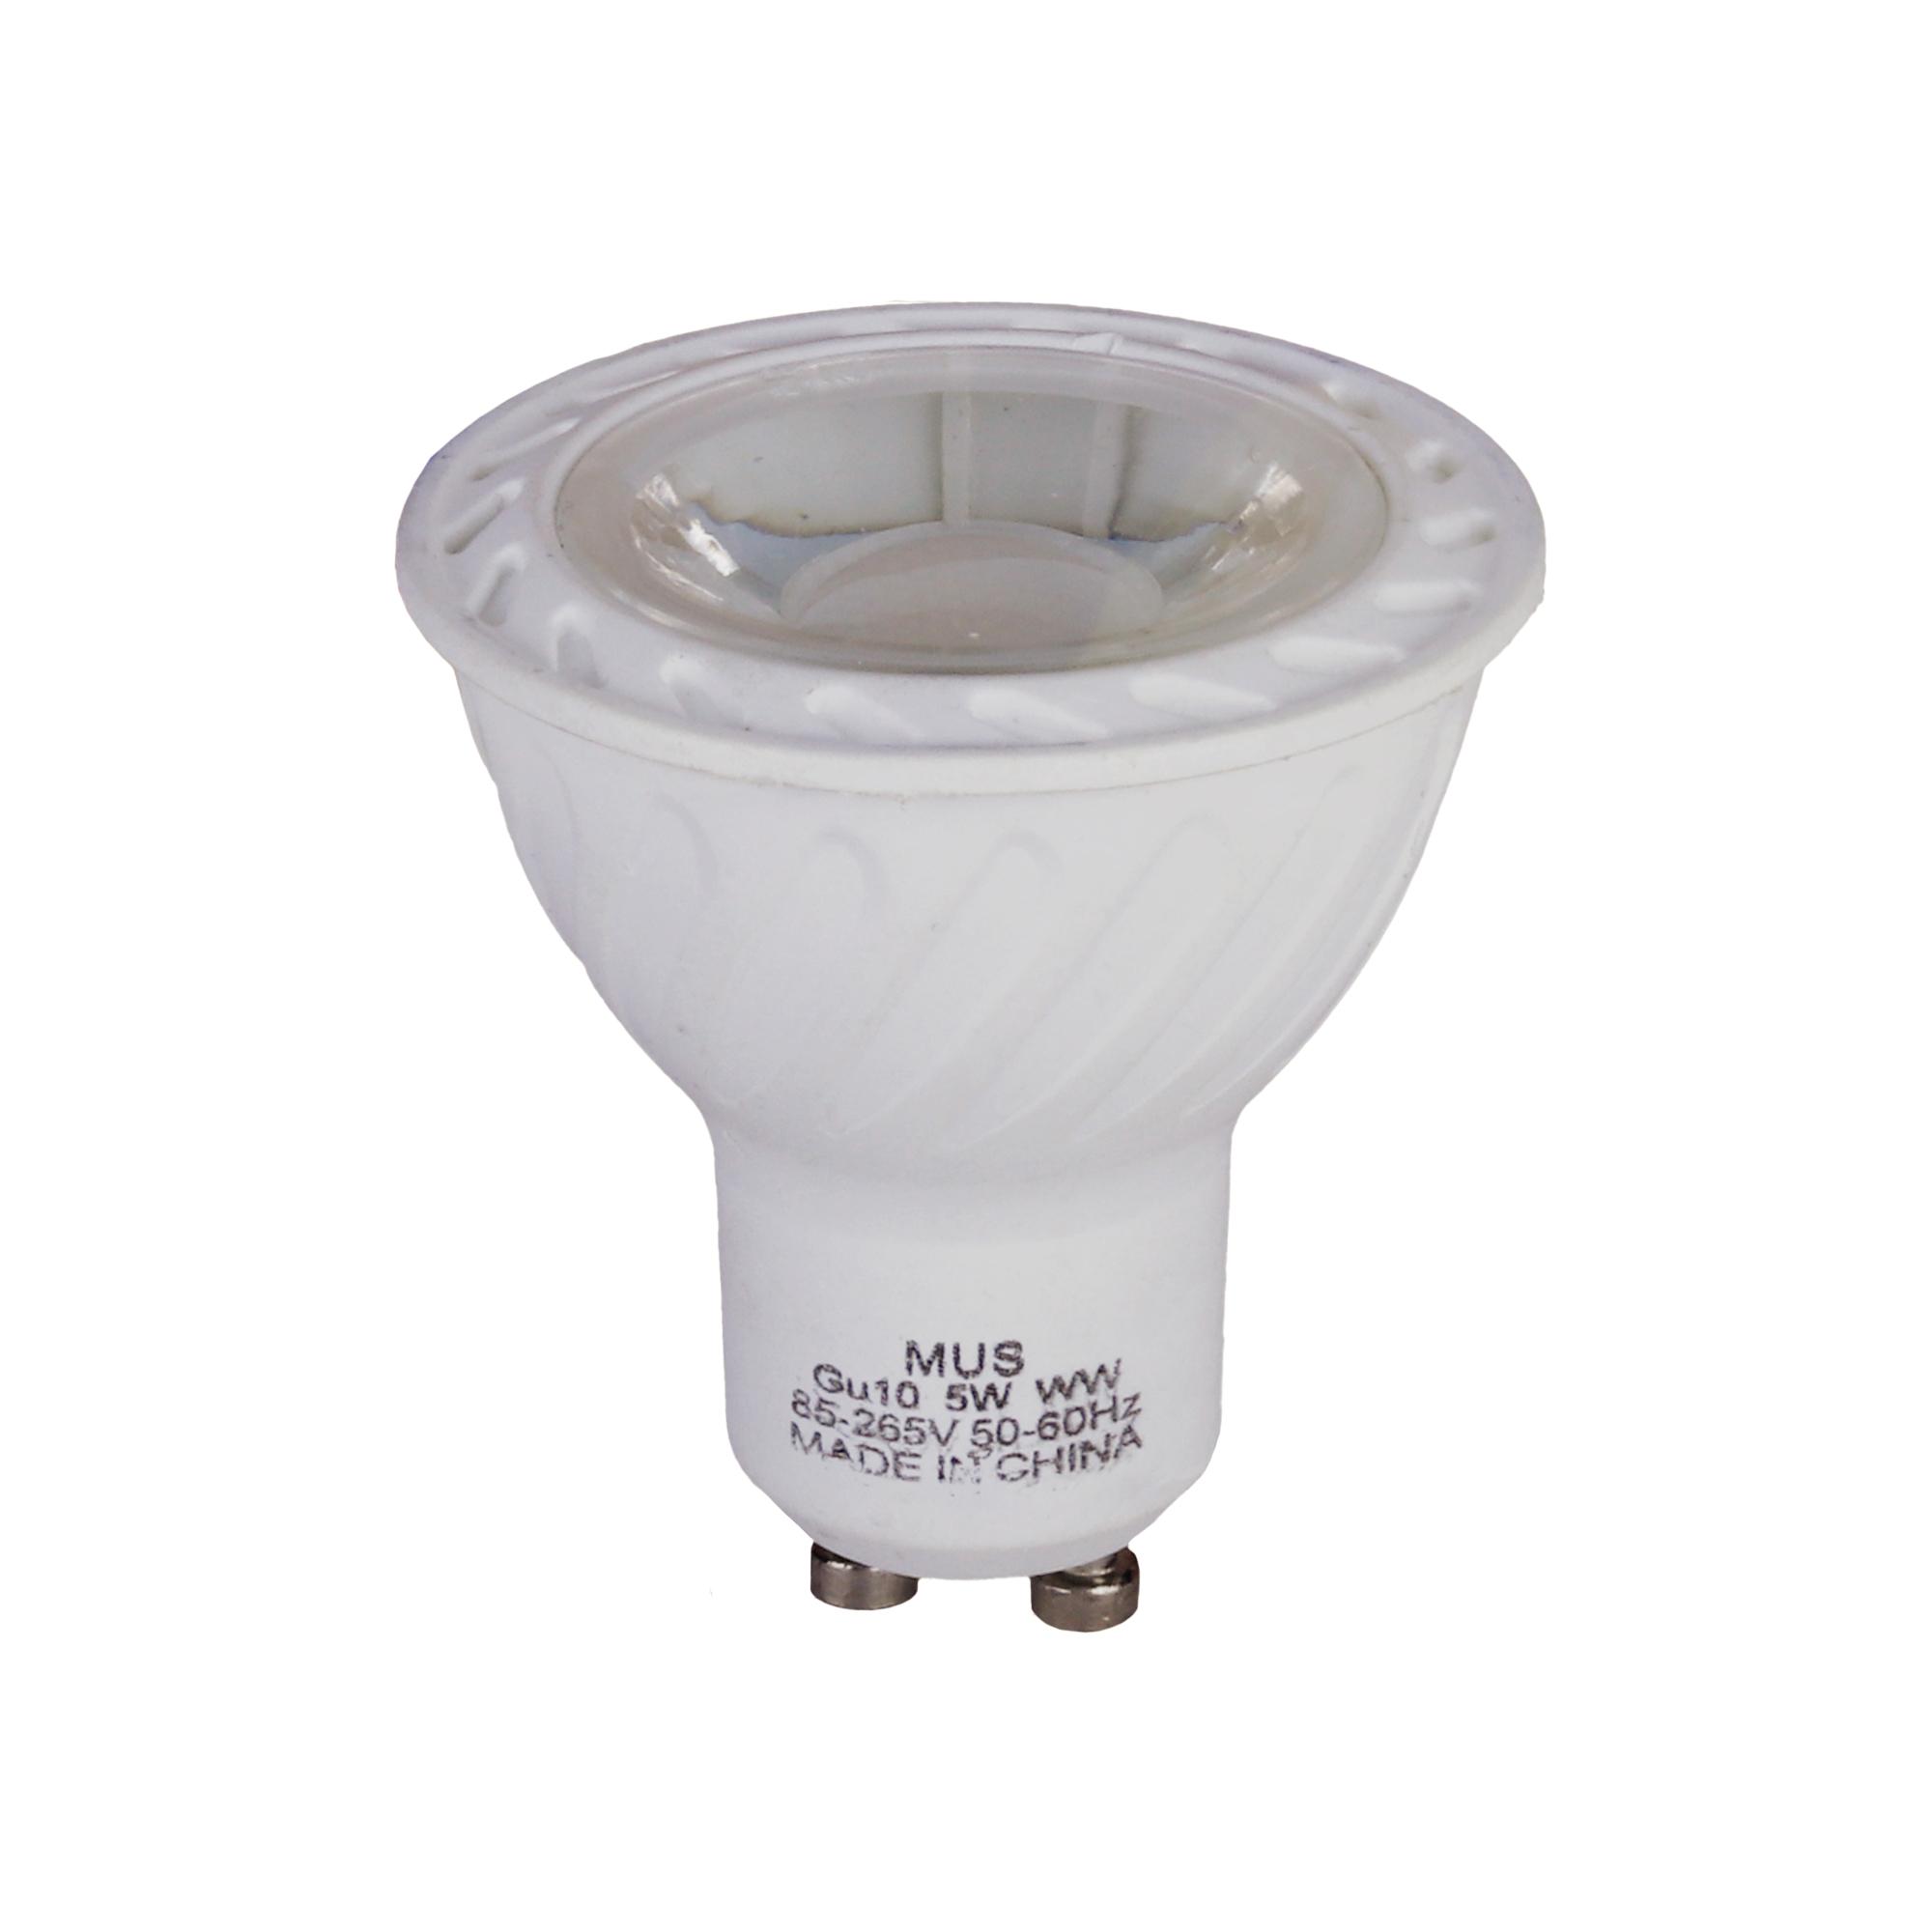 لامپ هالوژن 5 وات مدل MUS پایه GU10